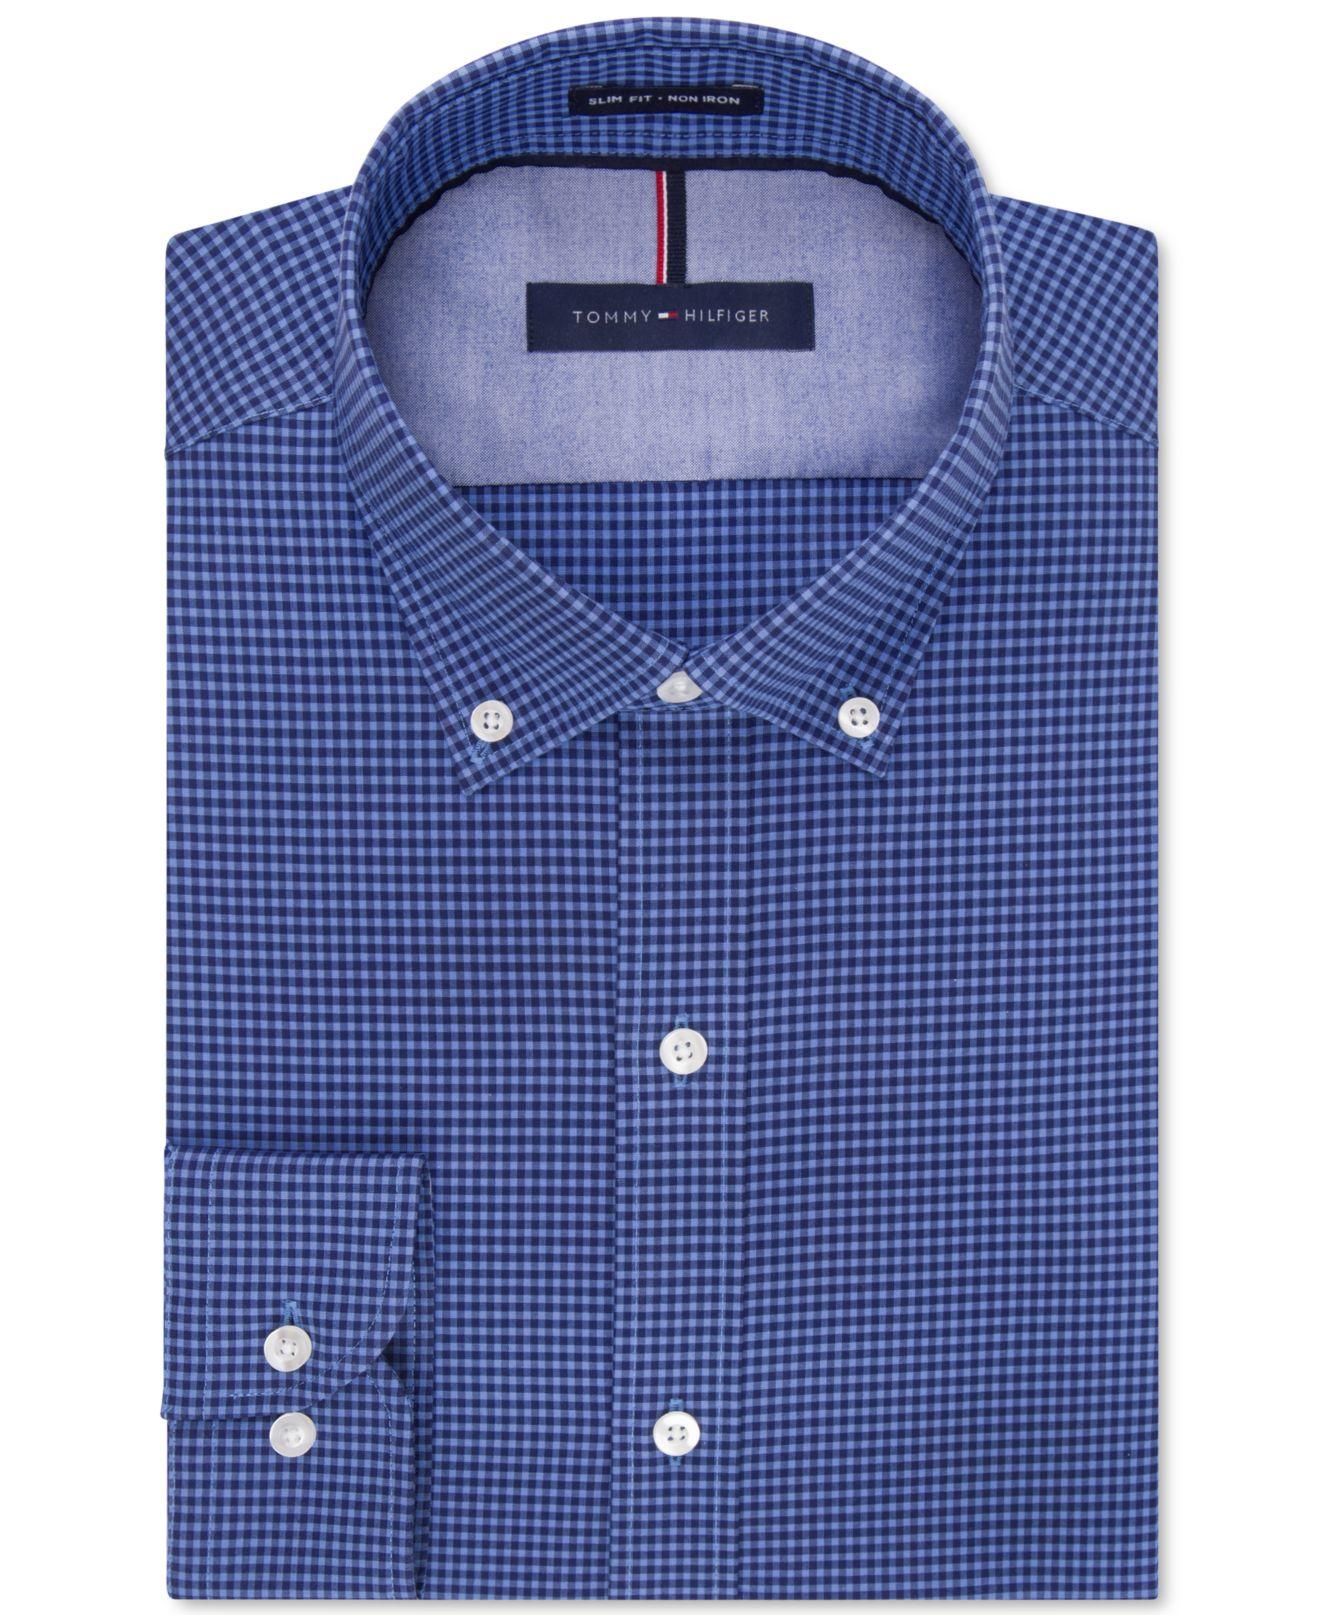 Tommy hilfiger slim fit non iron soft wash blue multi for Tommy hilfiger gingham dress shirt